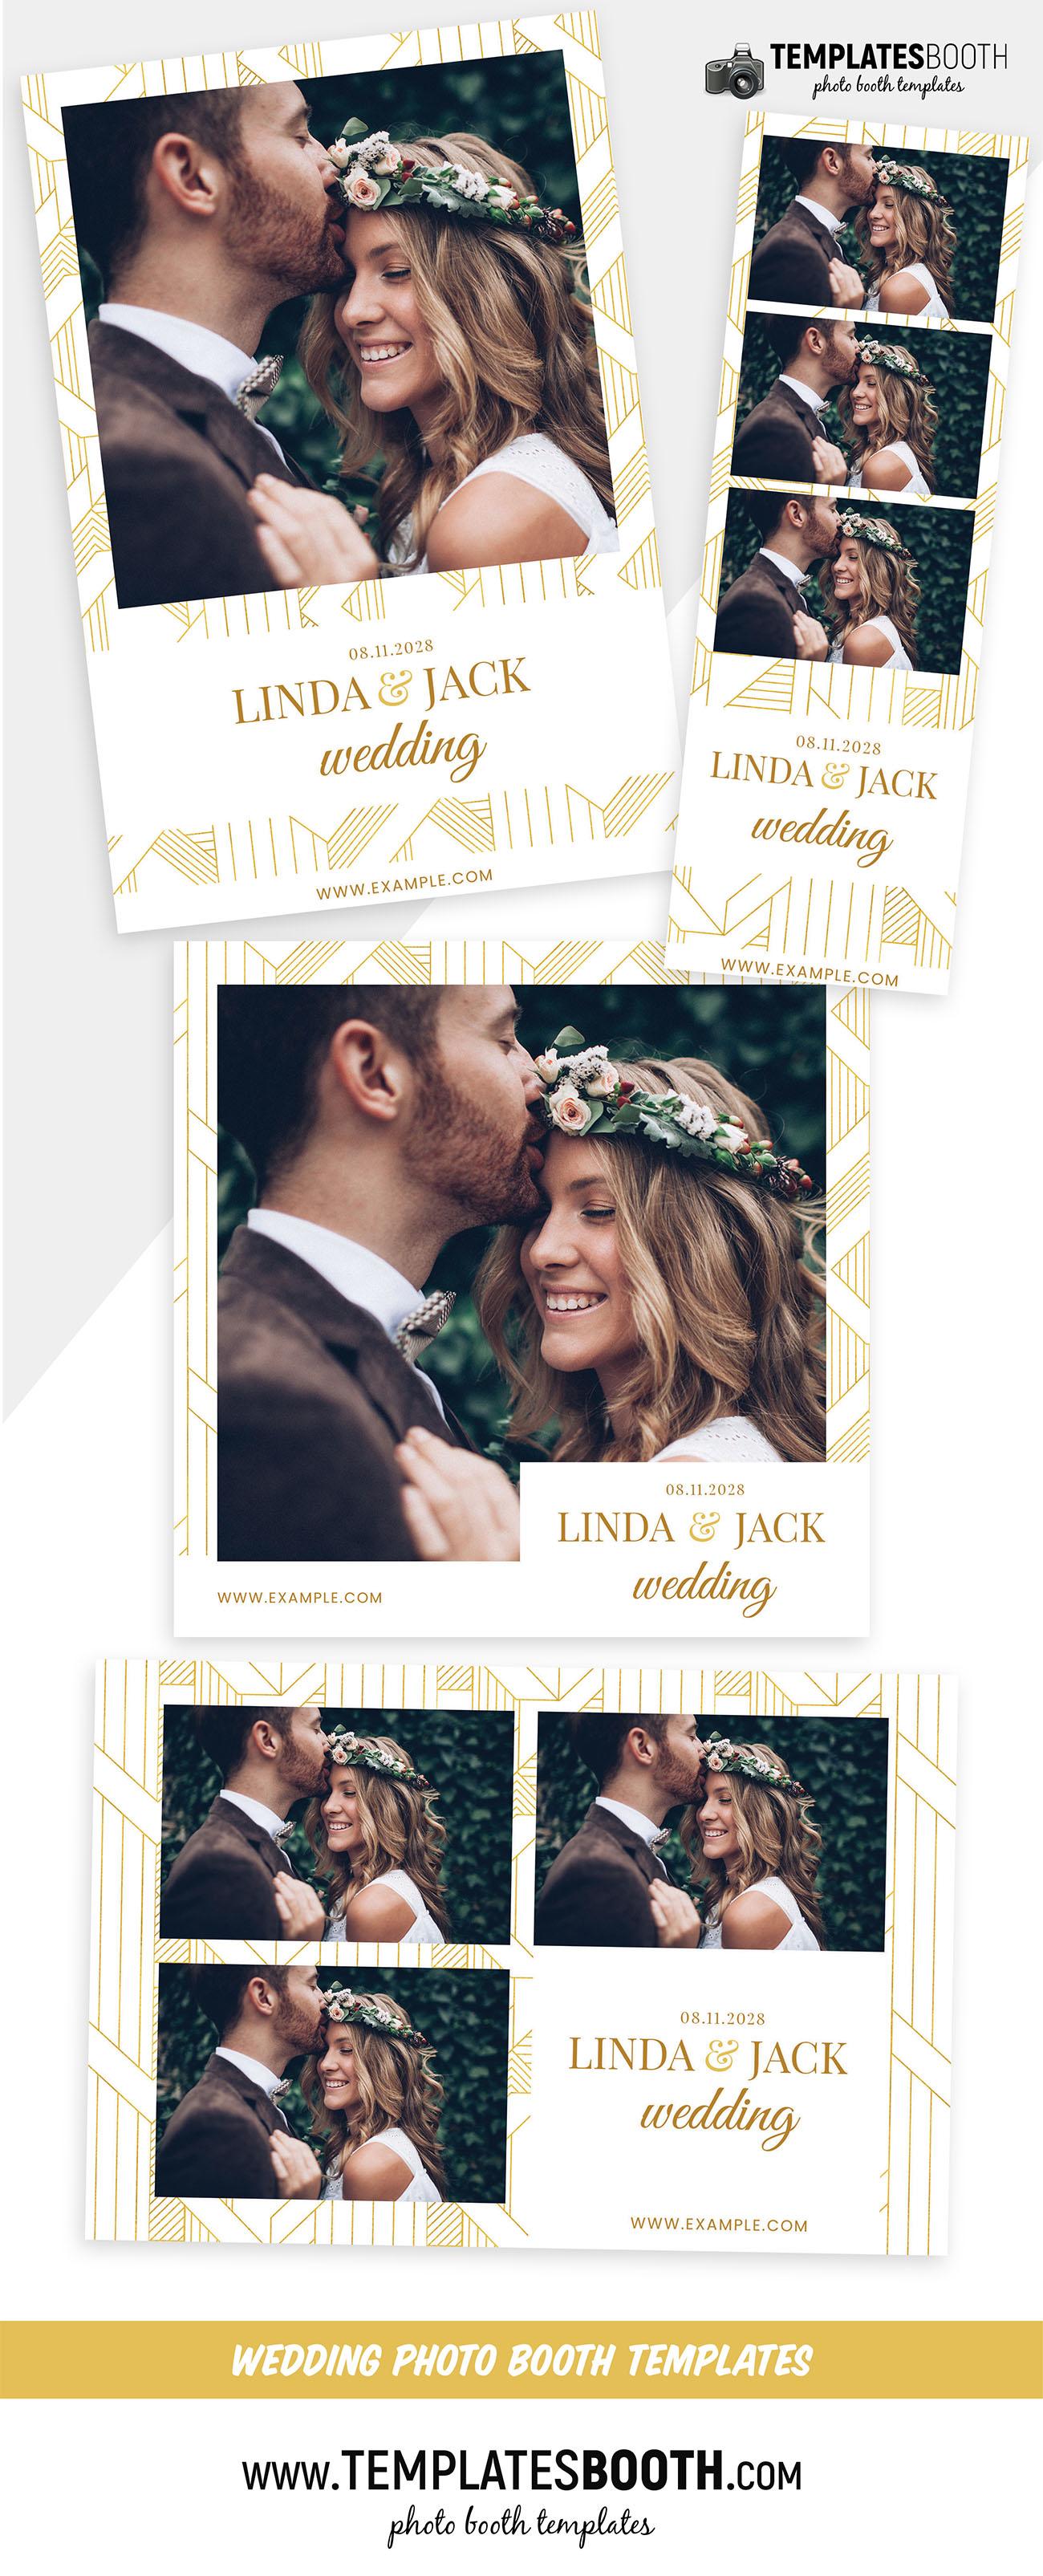 Minimal Art Deco Wedding Photo Booth Template (Photoshop PSD & DSLR Booth)